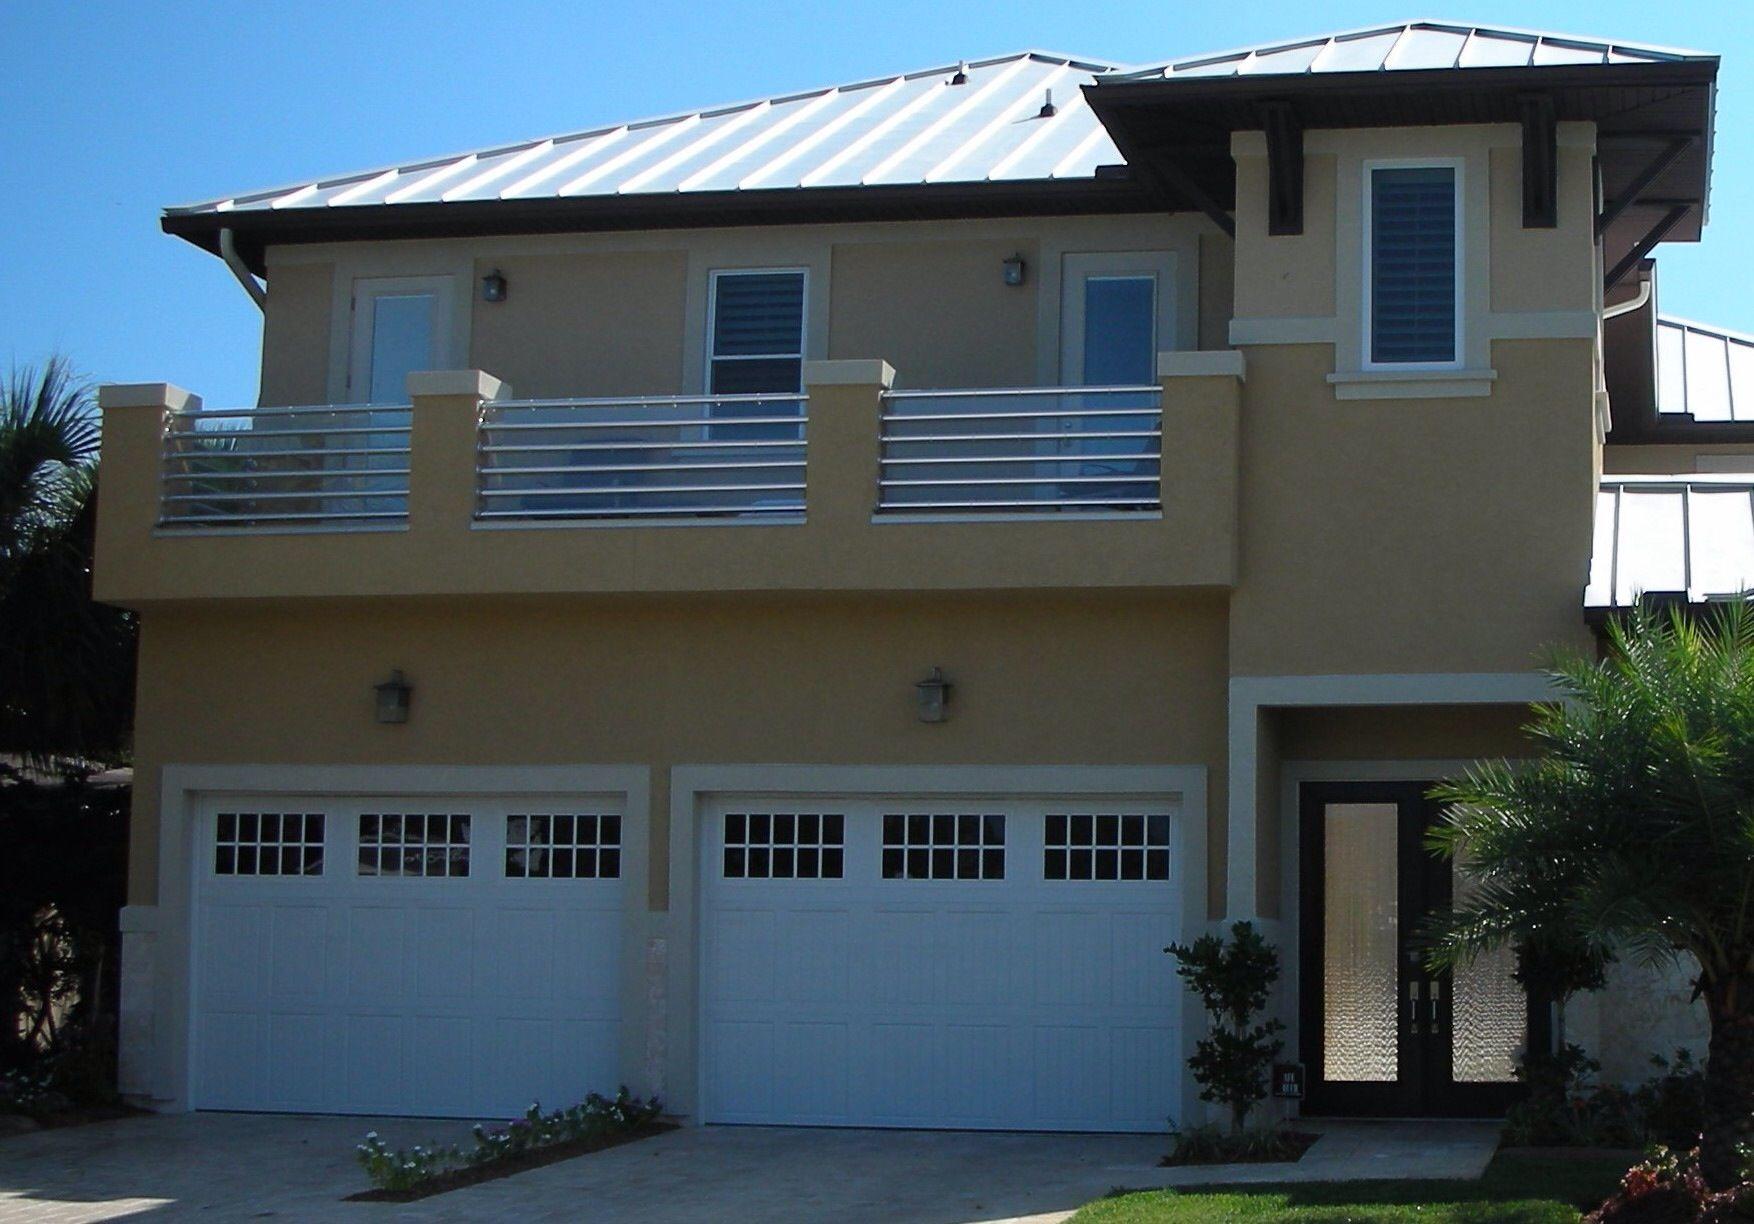 2 12 X 8 Custom Garage Doors Add Great Curb Appeal To This Jacksonville Beach Fl Home Custom Garage Doors Doors Garage Doors